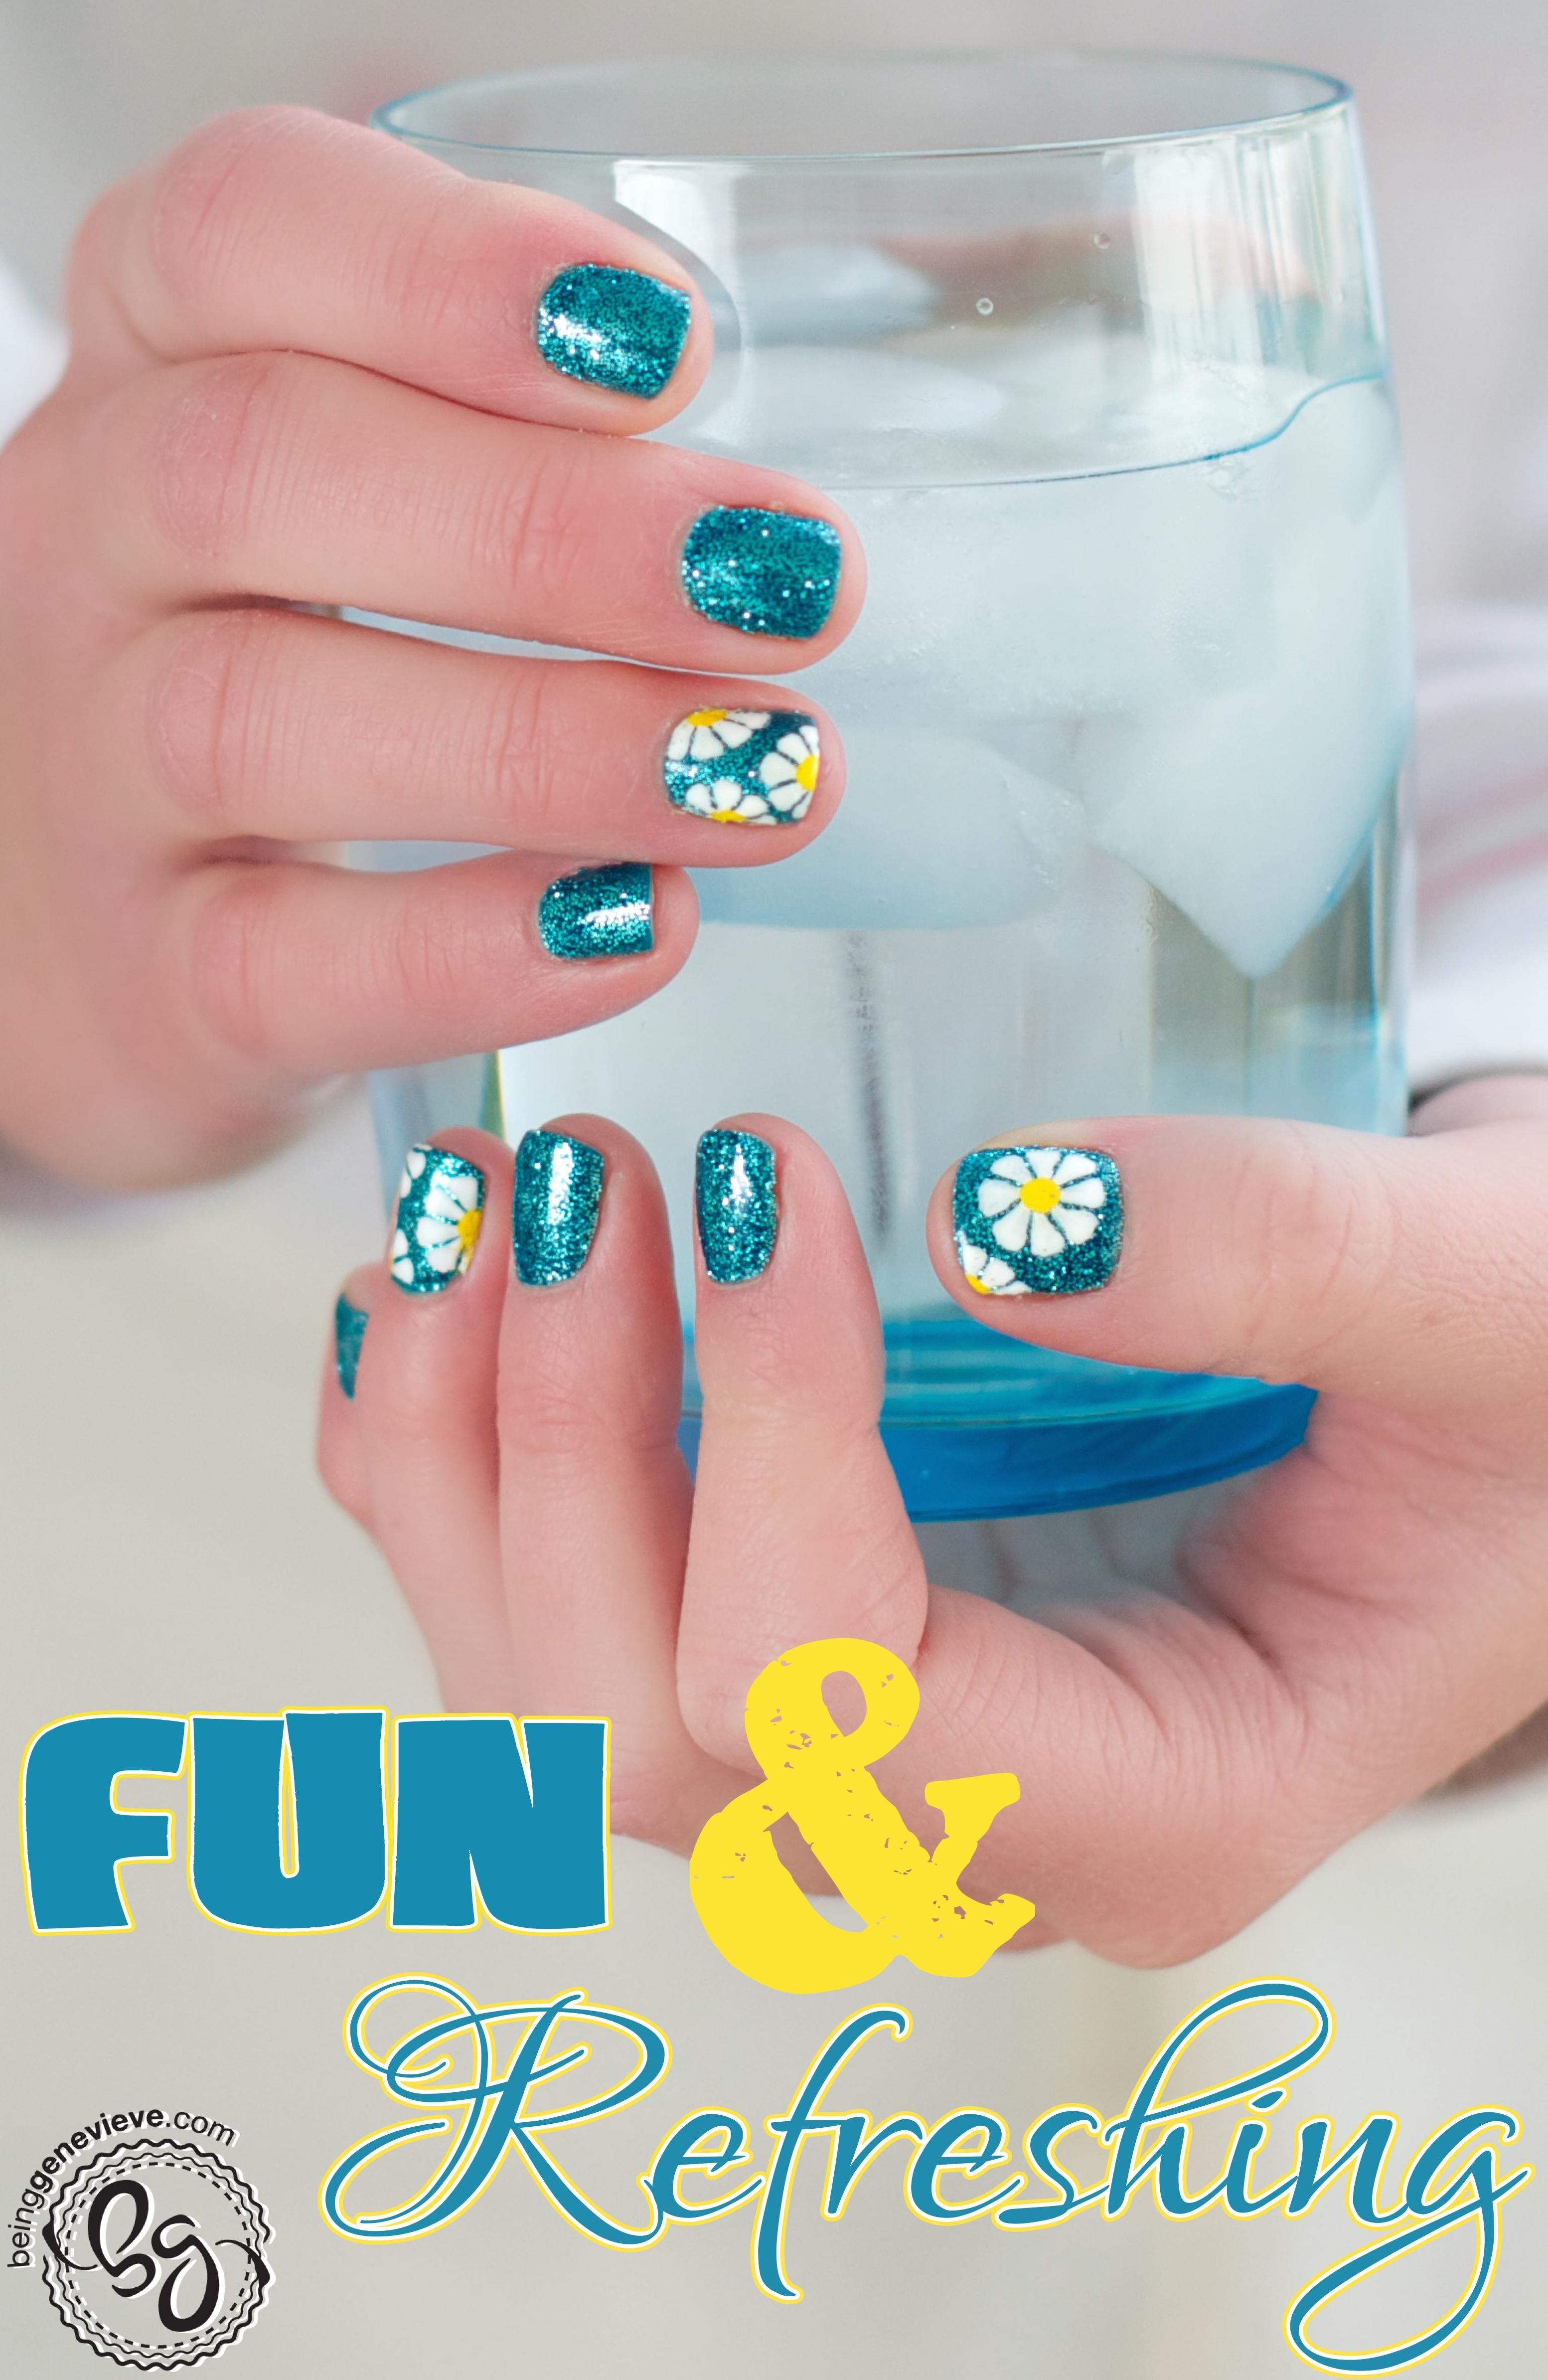 Fun & Refreshing